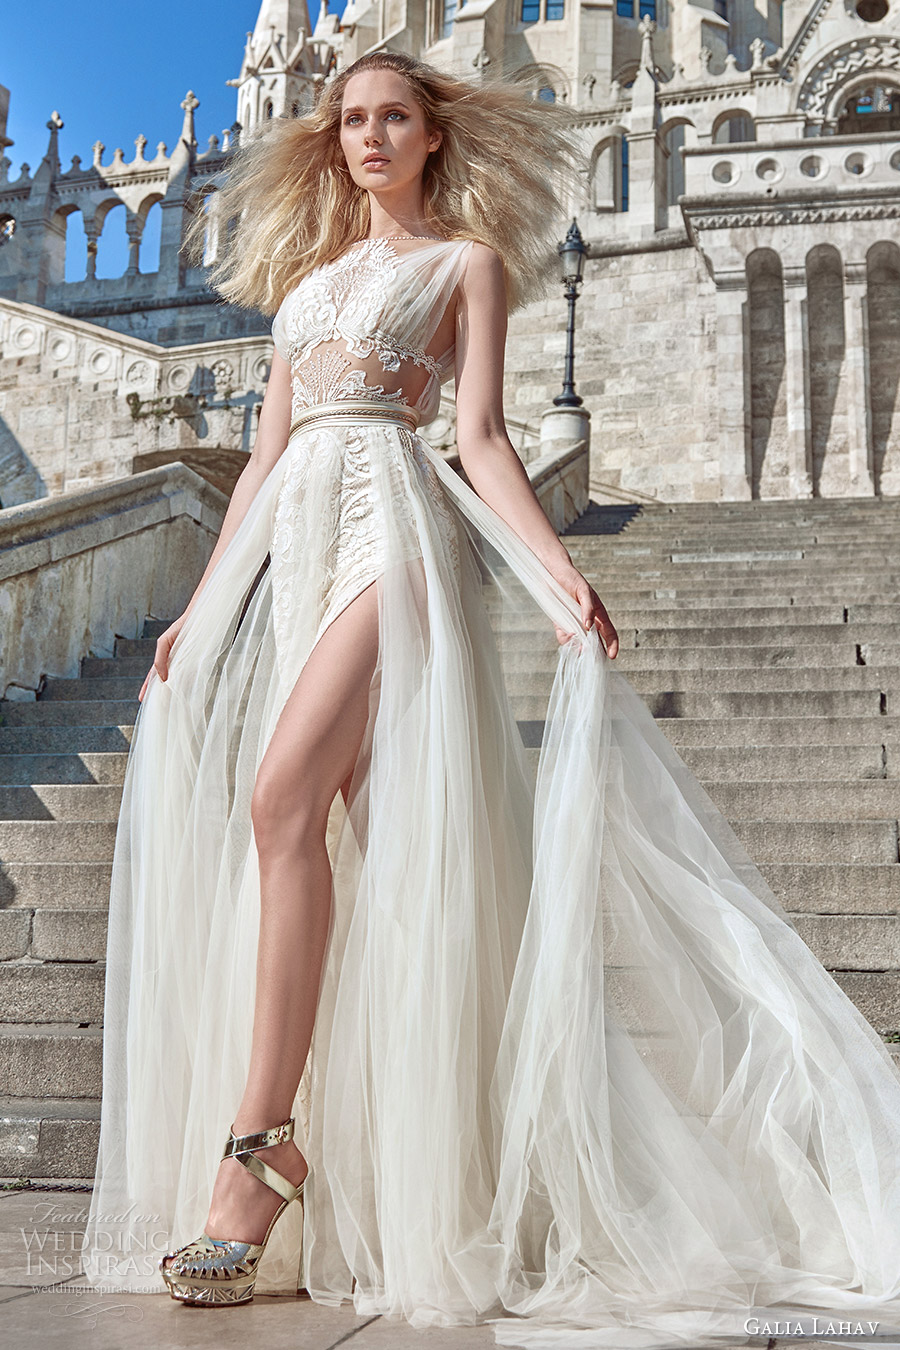 galia lahav fall 2016 bridal sleeveless illusion jewel neck draped straps illusion bodice a line overskirt wedding dress (flavia) grecian edgy mv